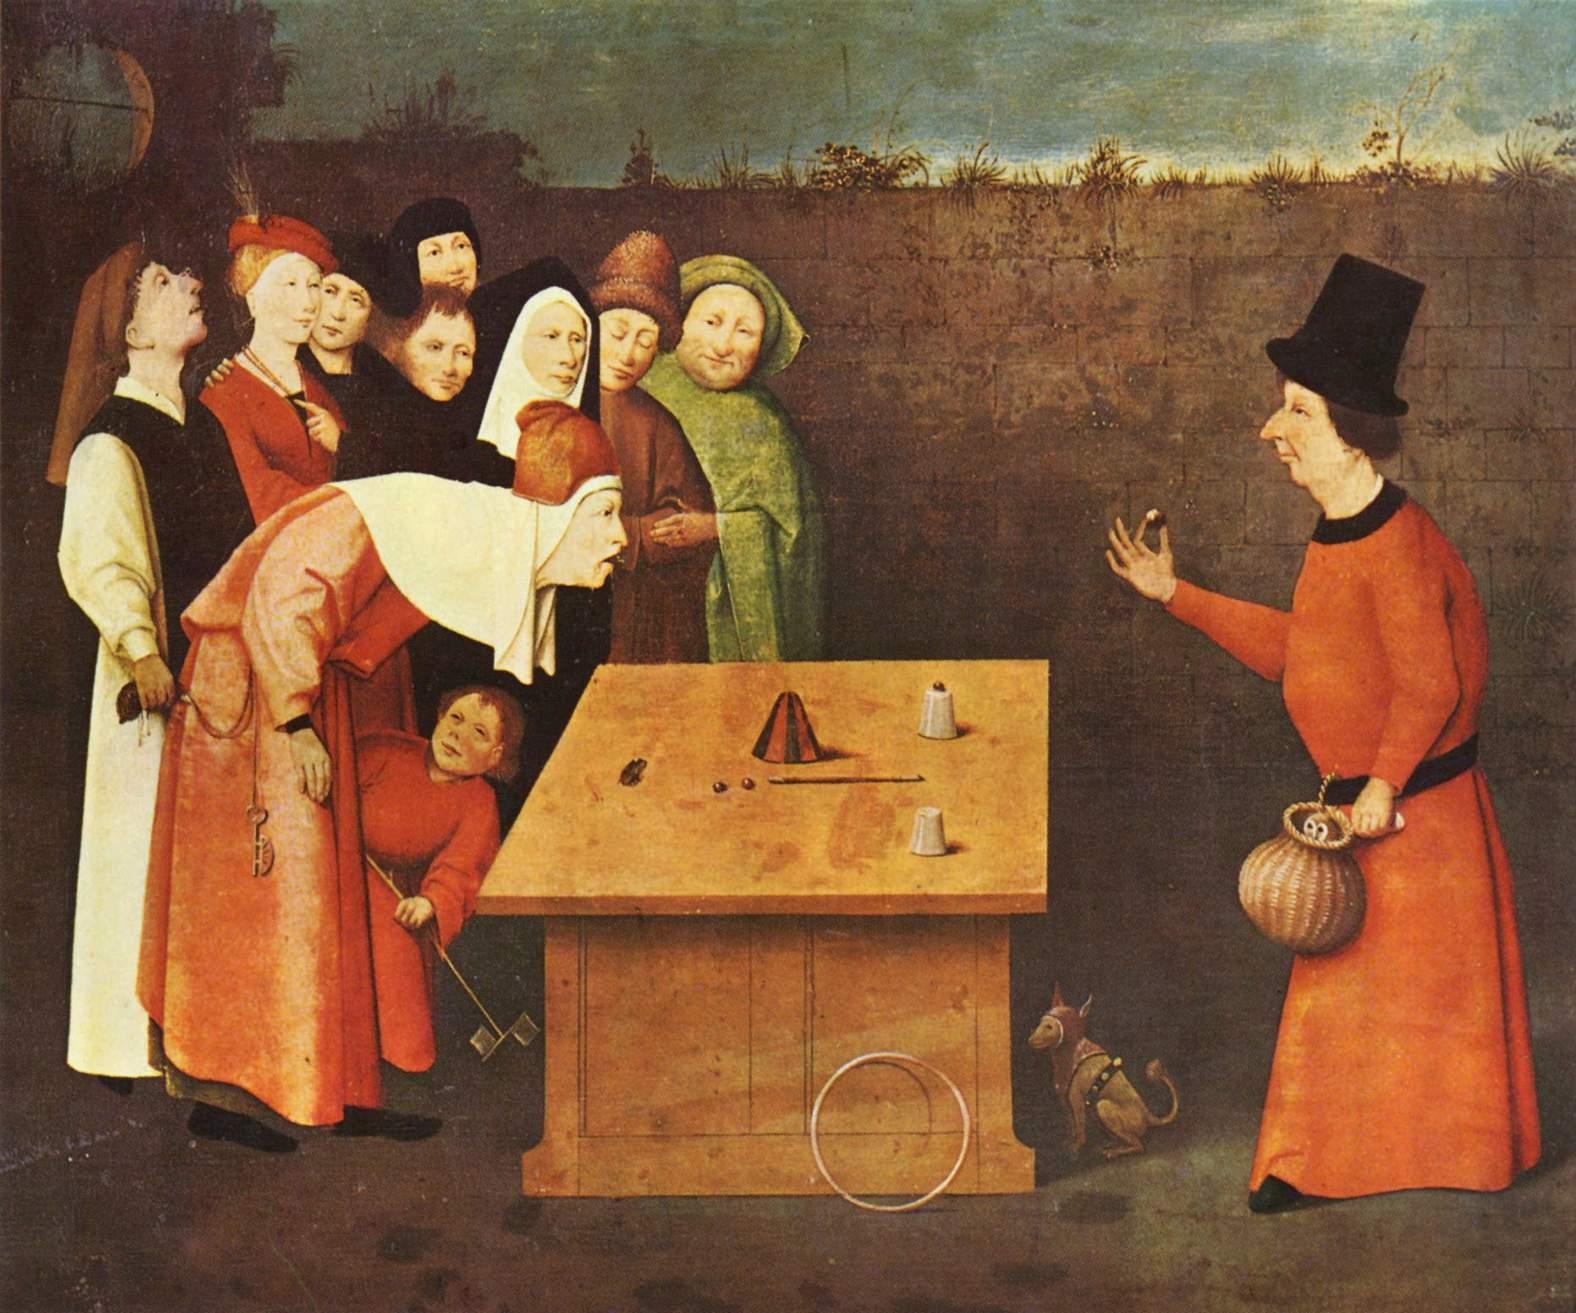 Hieronymus_Bosch_051.jpg